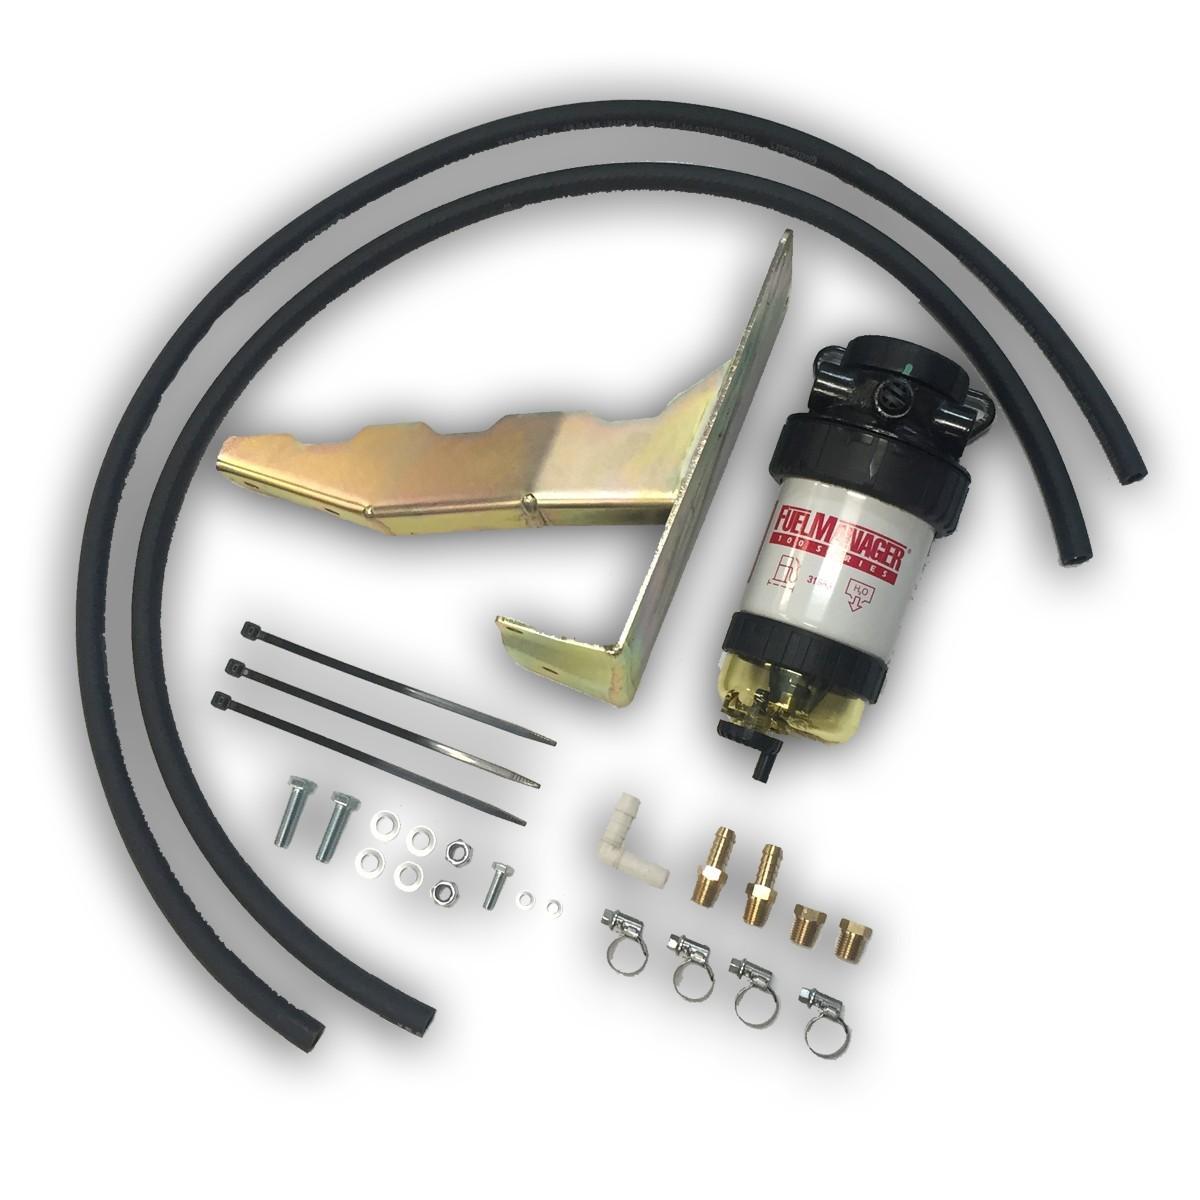 Toyota Fortuner (2015-Present) 2.8L D4D Primary (PRE) Fuel Filter Kit